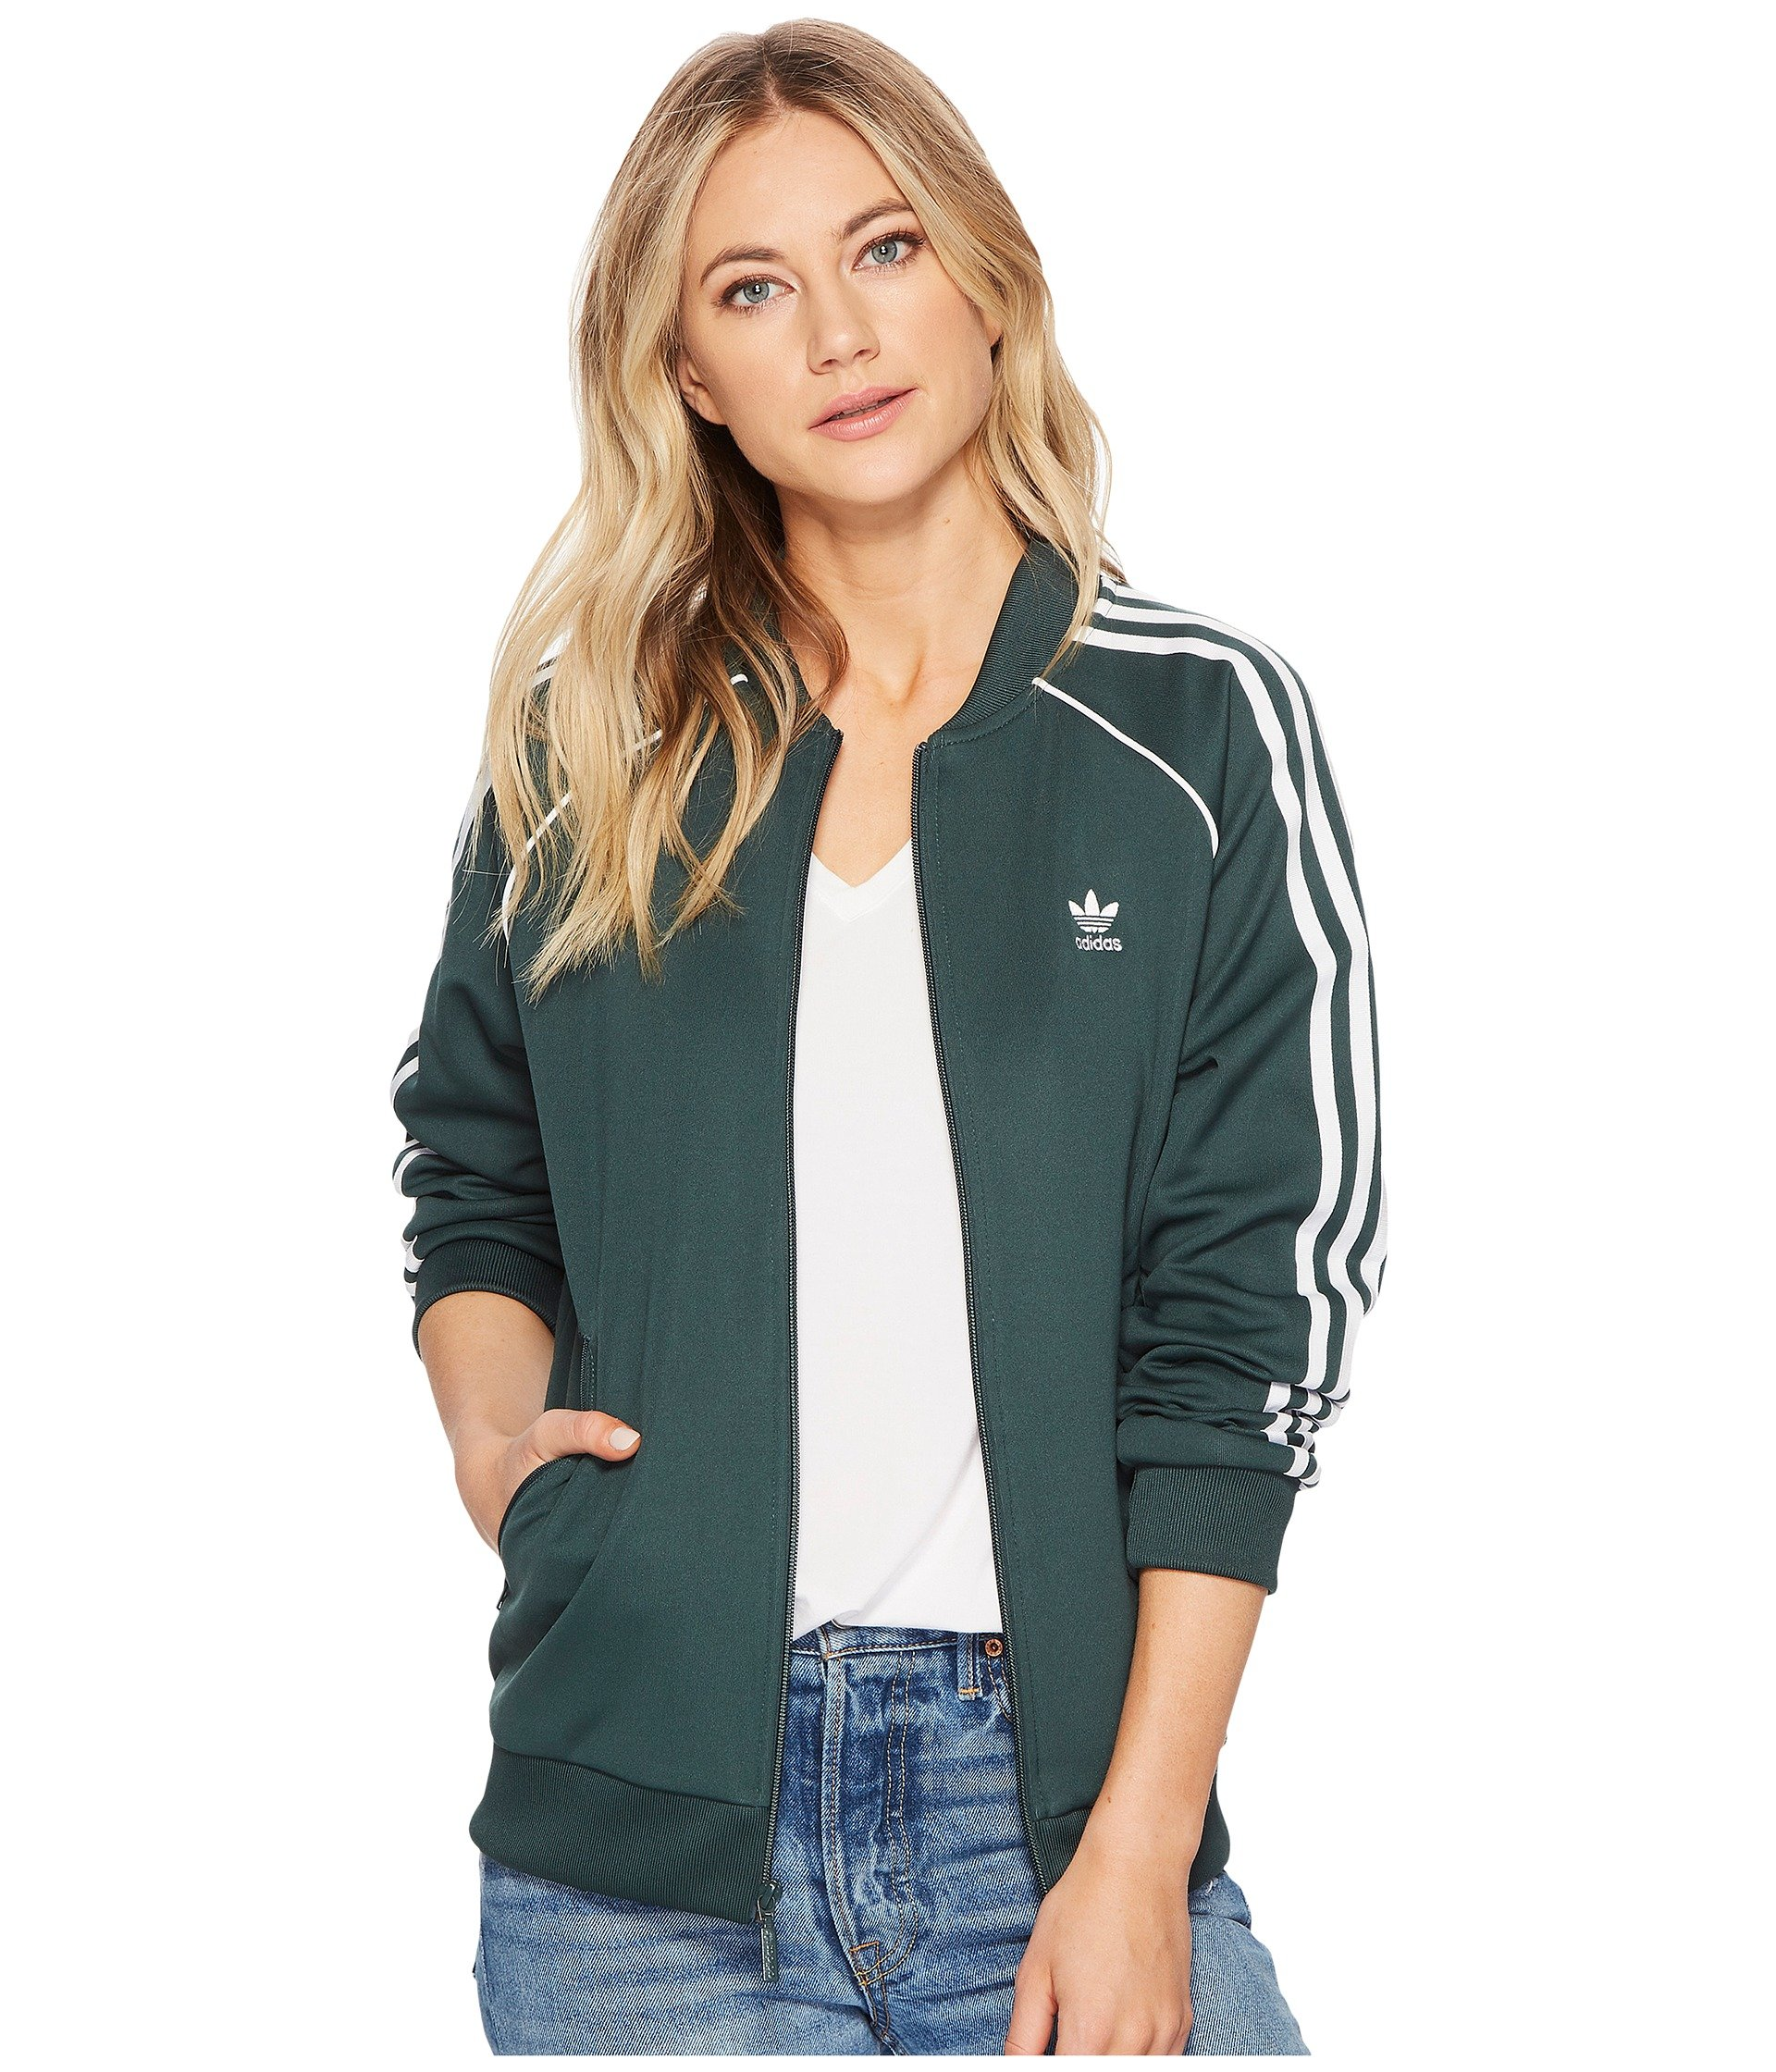 adidas Originals Women Navy SST Track Jacket 70% polyester